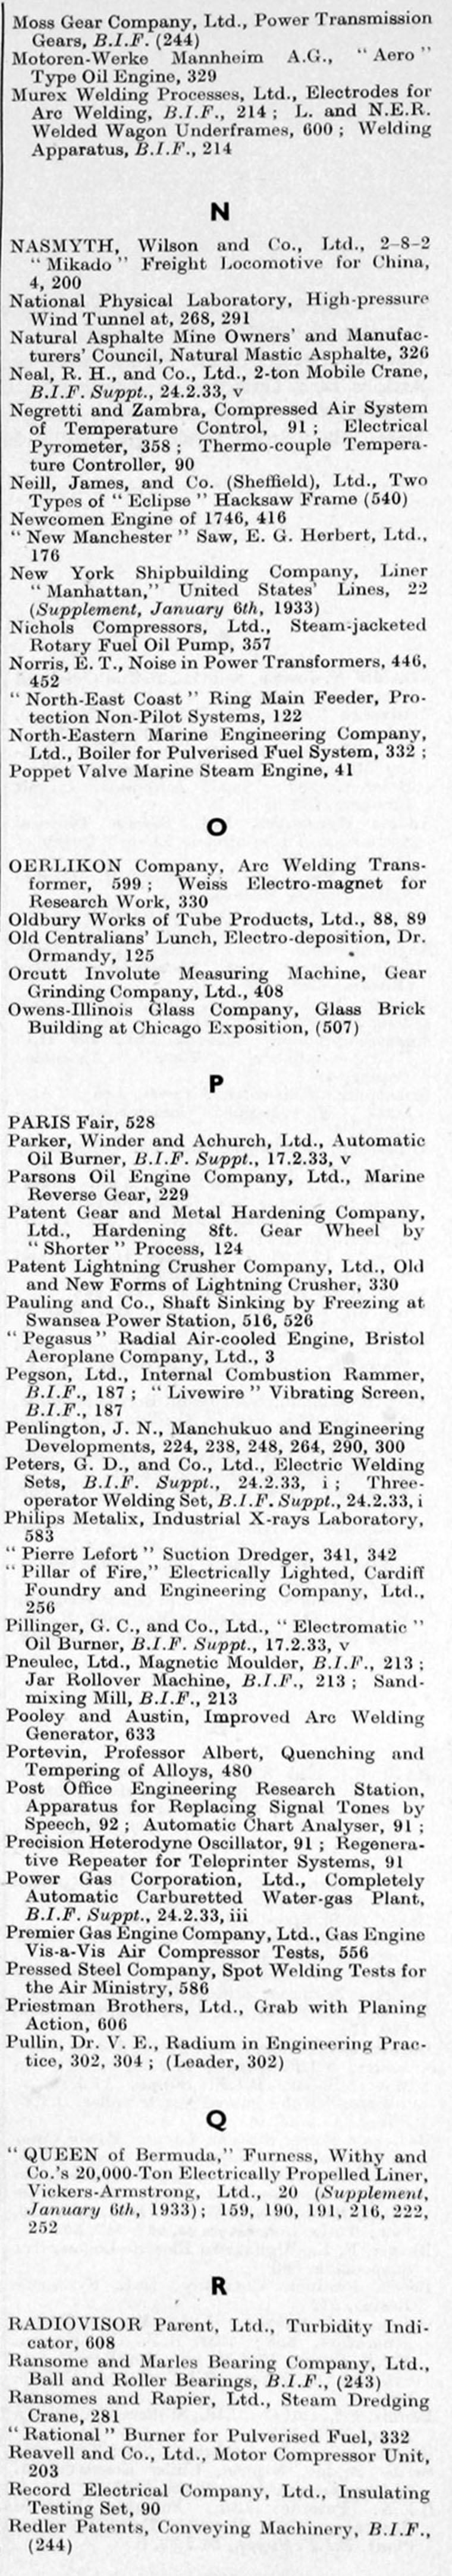 The Engineer 1933 Jan Jun Index Ideal Circuit Breaker Finder 61 532 Eectrical Recievertransmitter